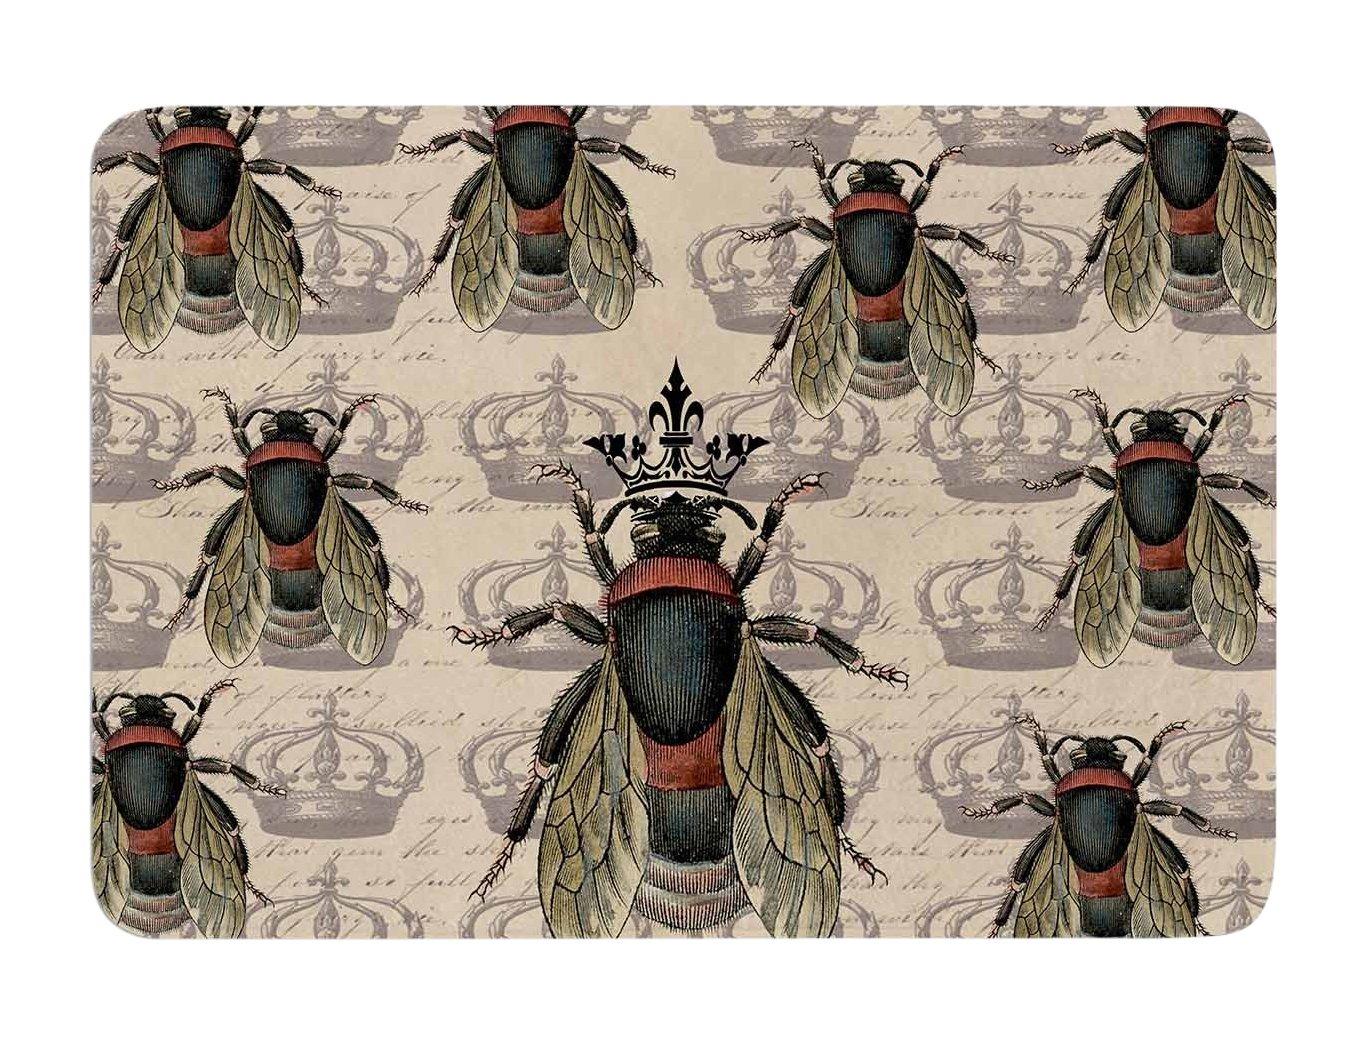 Kess InHouse Suzanne Carter Queen Bee Black Tan Memory Foam Bath Mat, 17 by 24-Inch, 17' X 24'